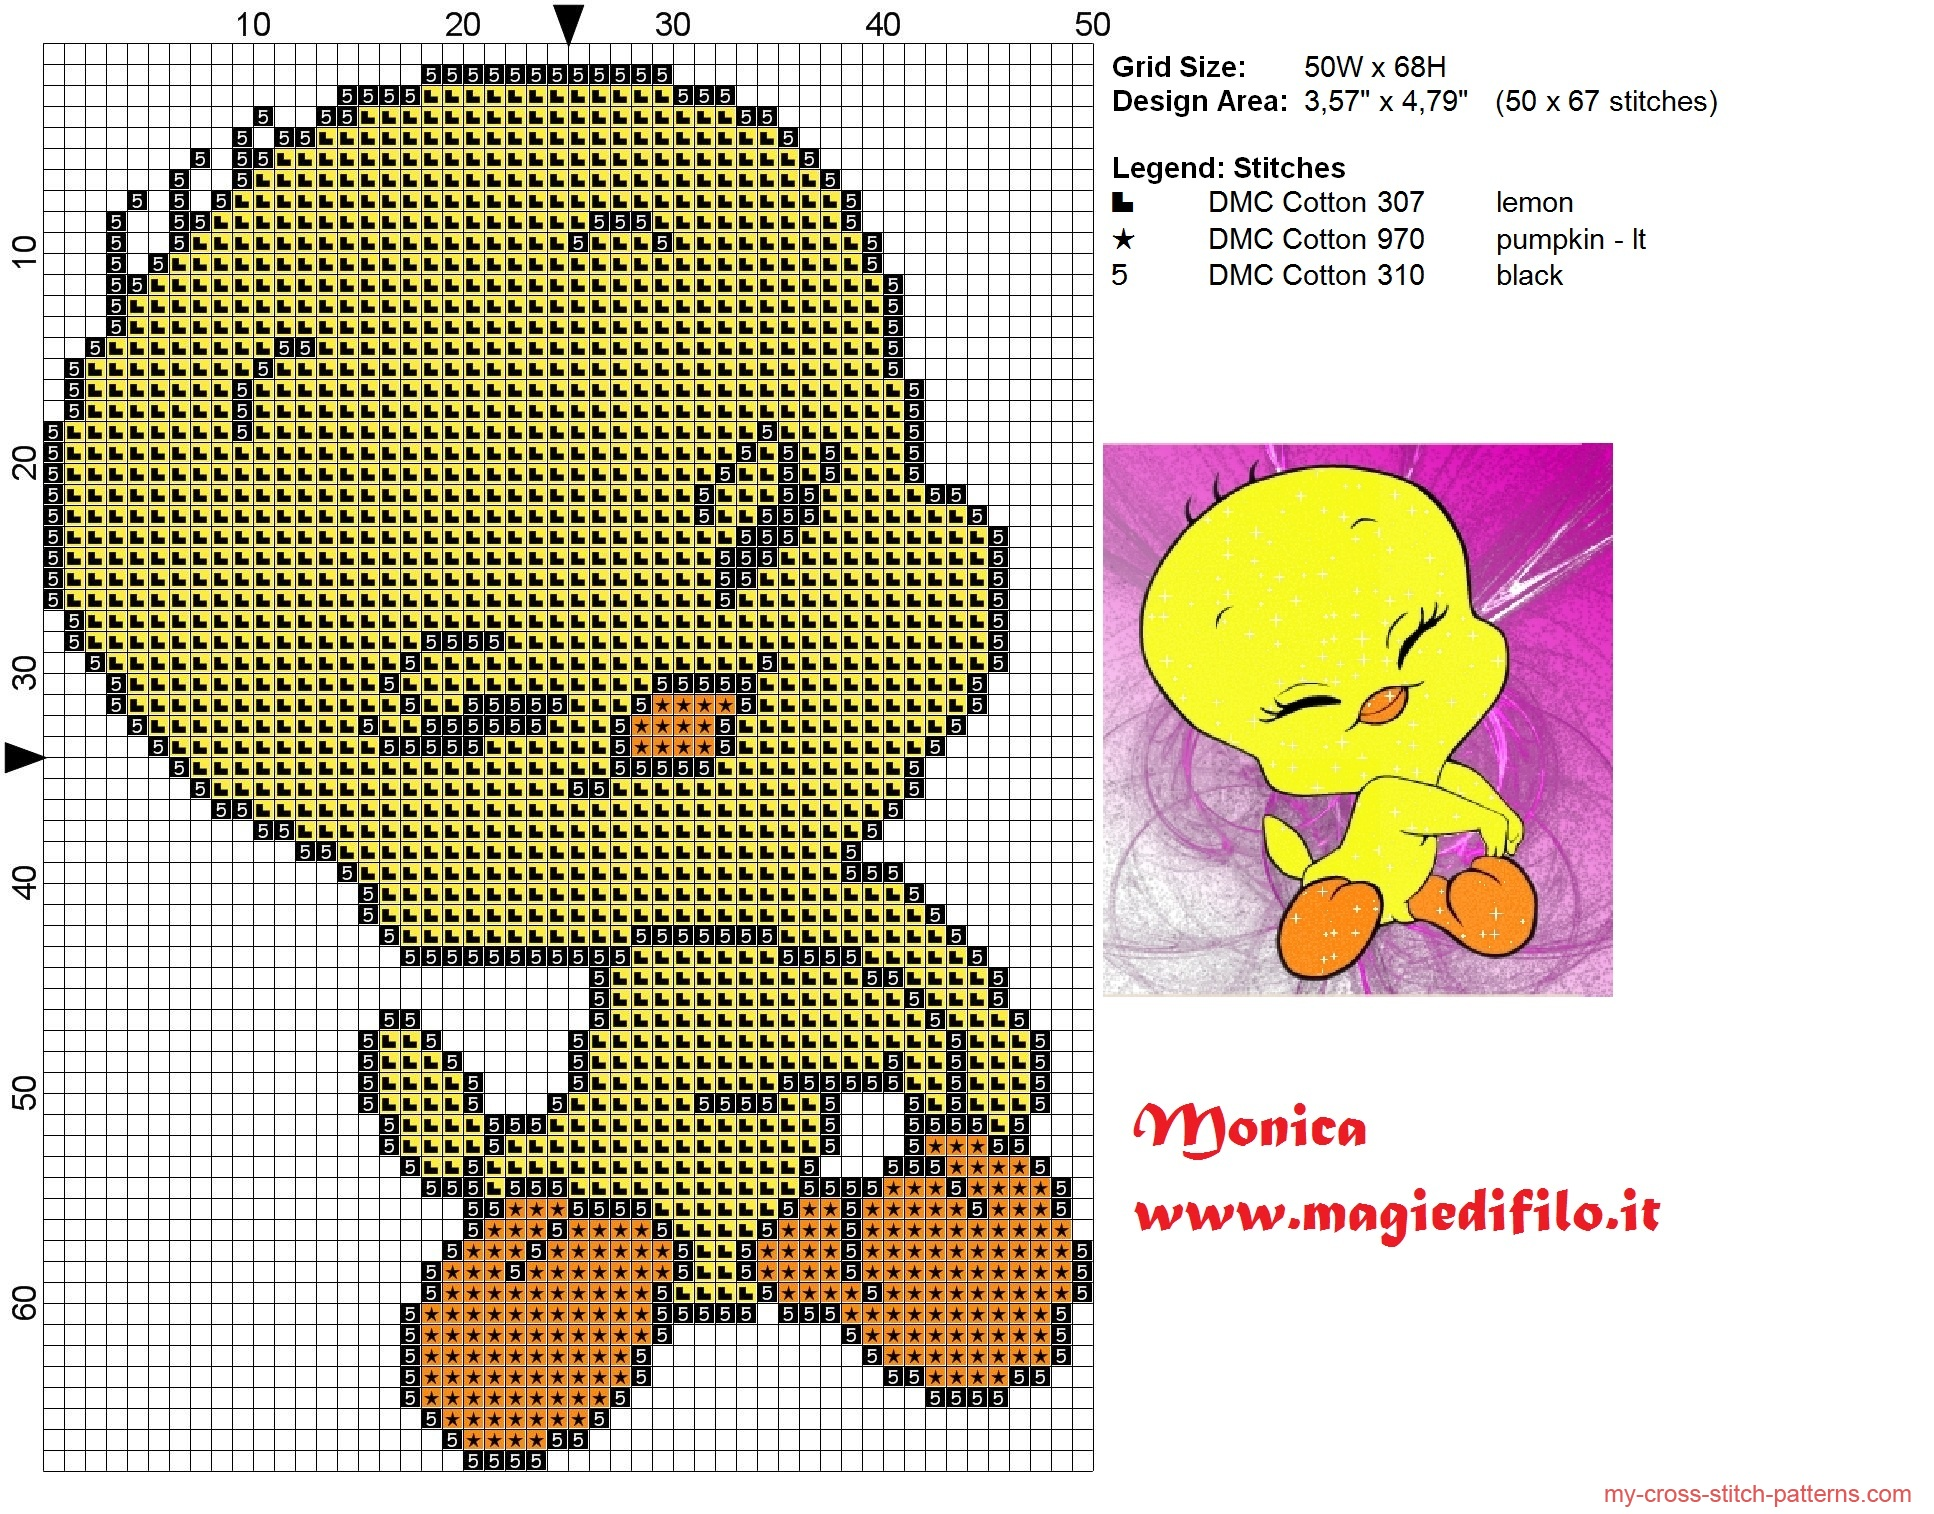 tweety_cross_stitch_pattern